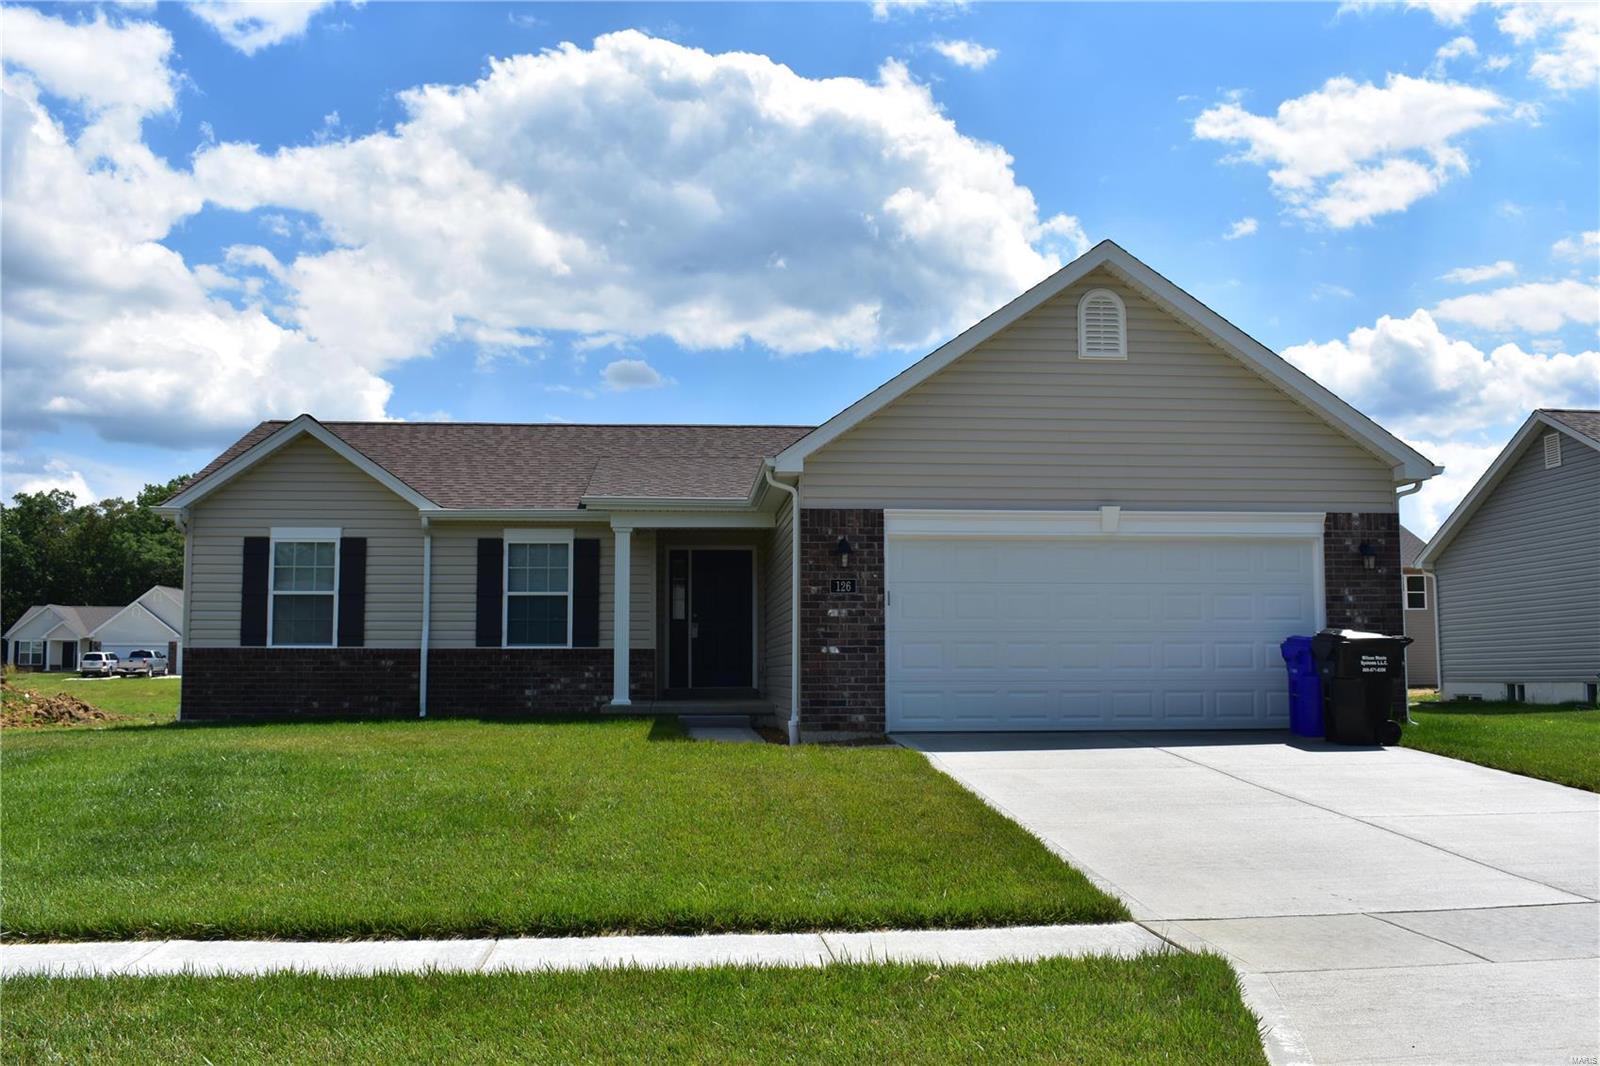 128 TBB-Lot 54 Bryan Ridge Property Photo - Wright City, MO real estate listing